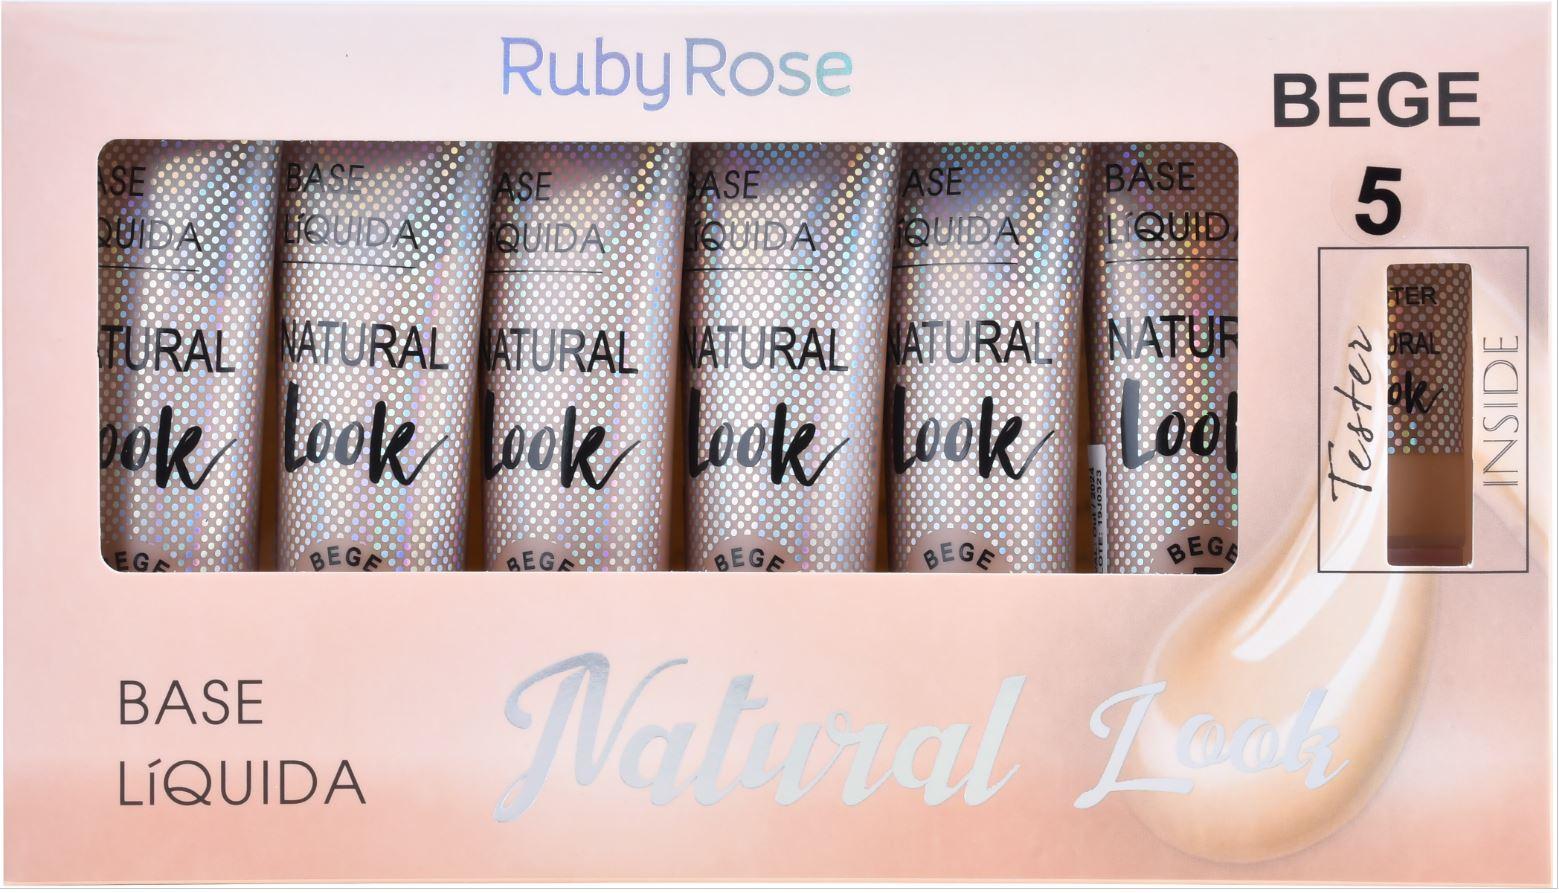 BOX DE BASE NATURAL LOOK BEGE 5  - RUBY ROSE